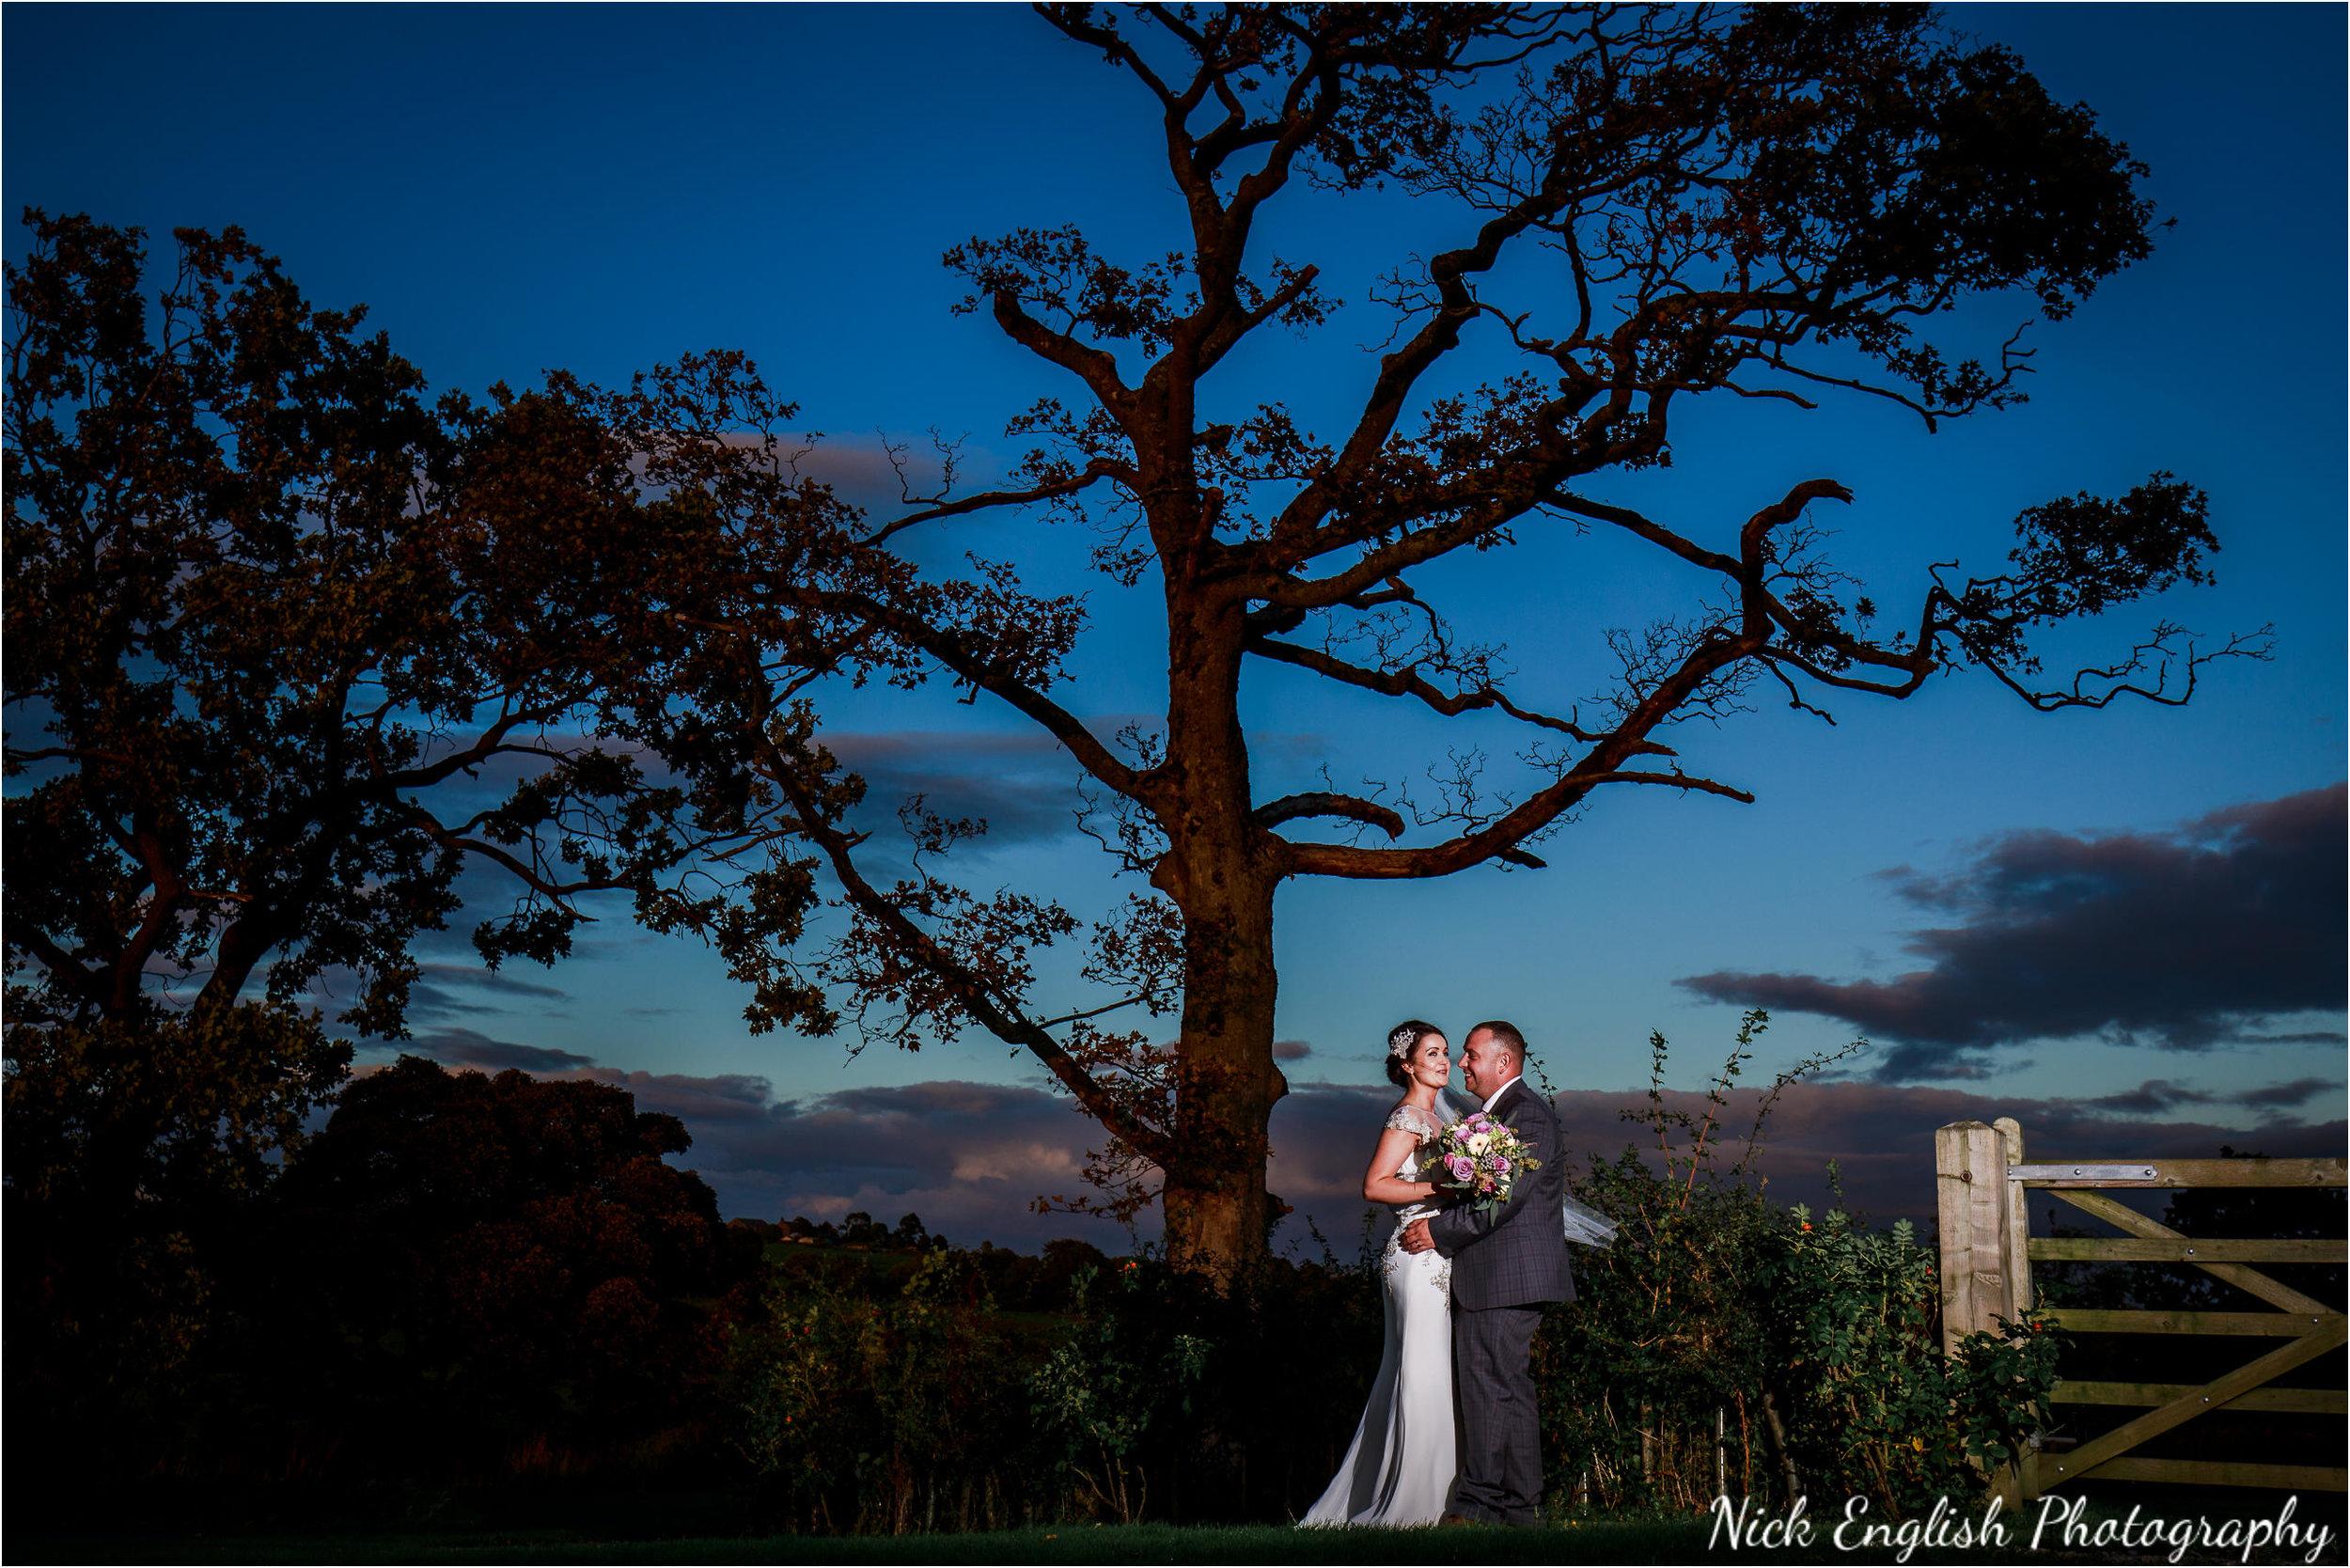 Stacey-Ash-Wedding-Photographs-Stanley-House-Preston-Lancashire-226.jpg